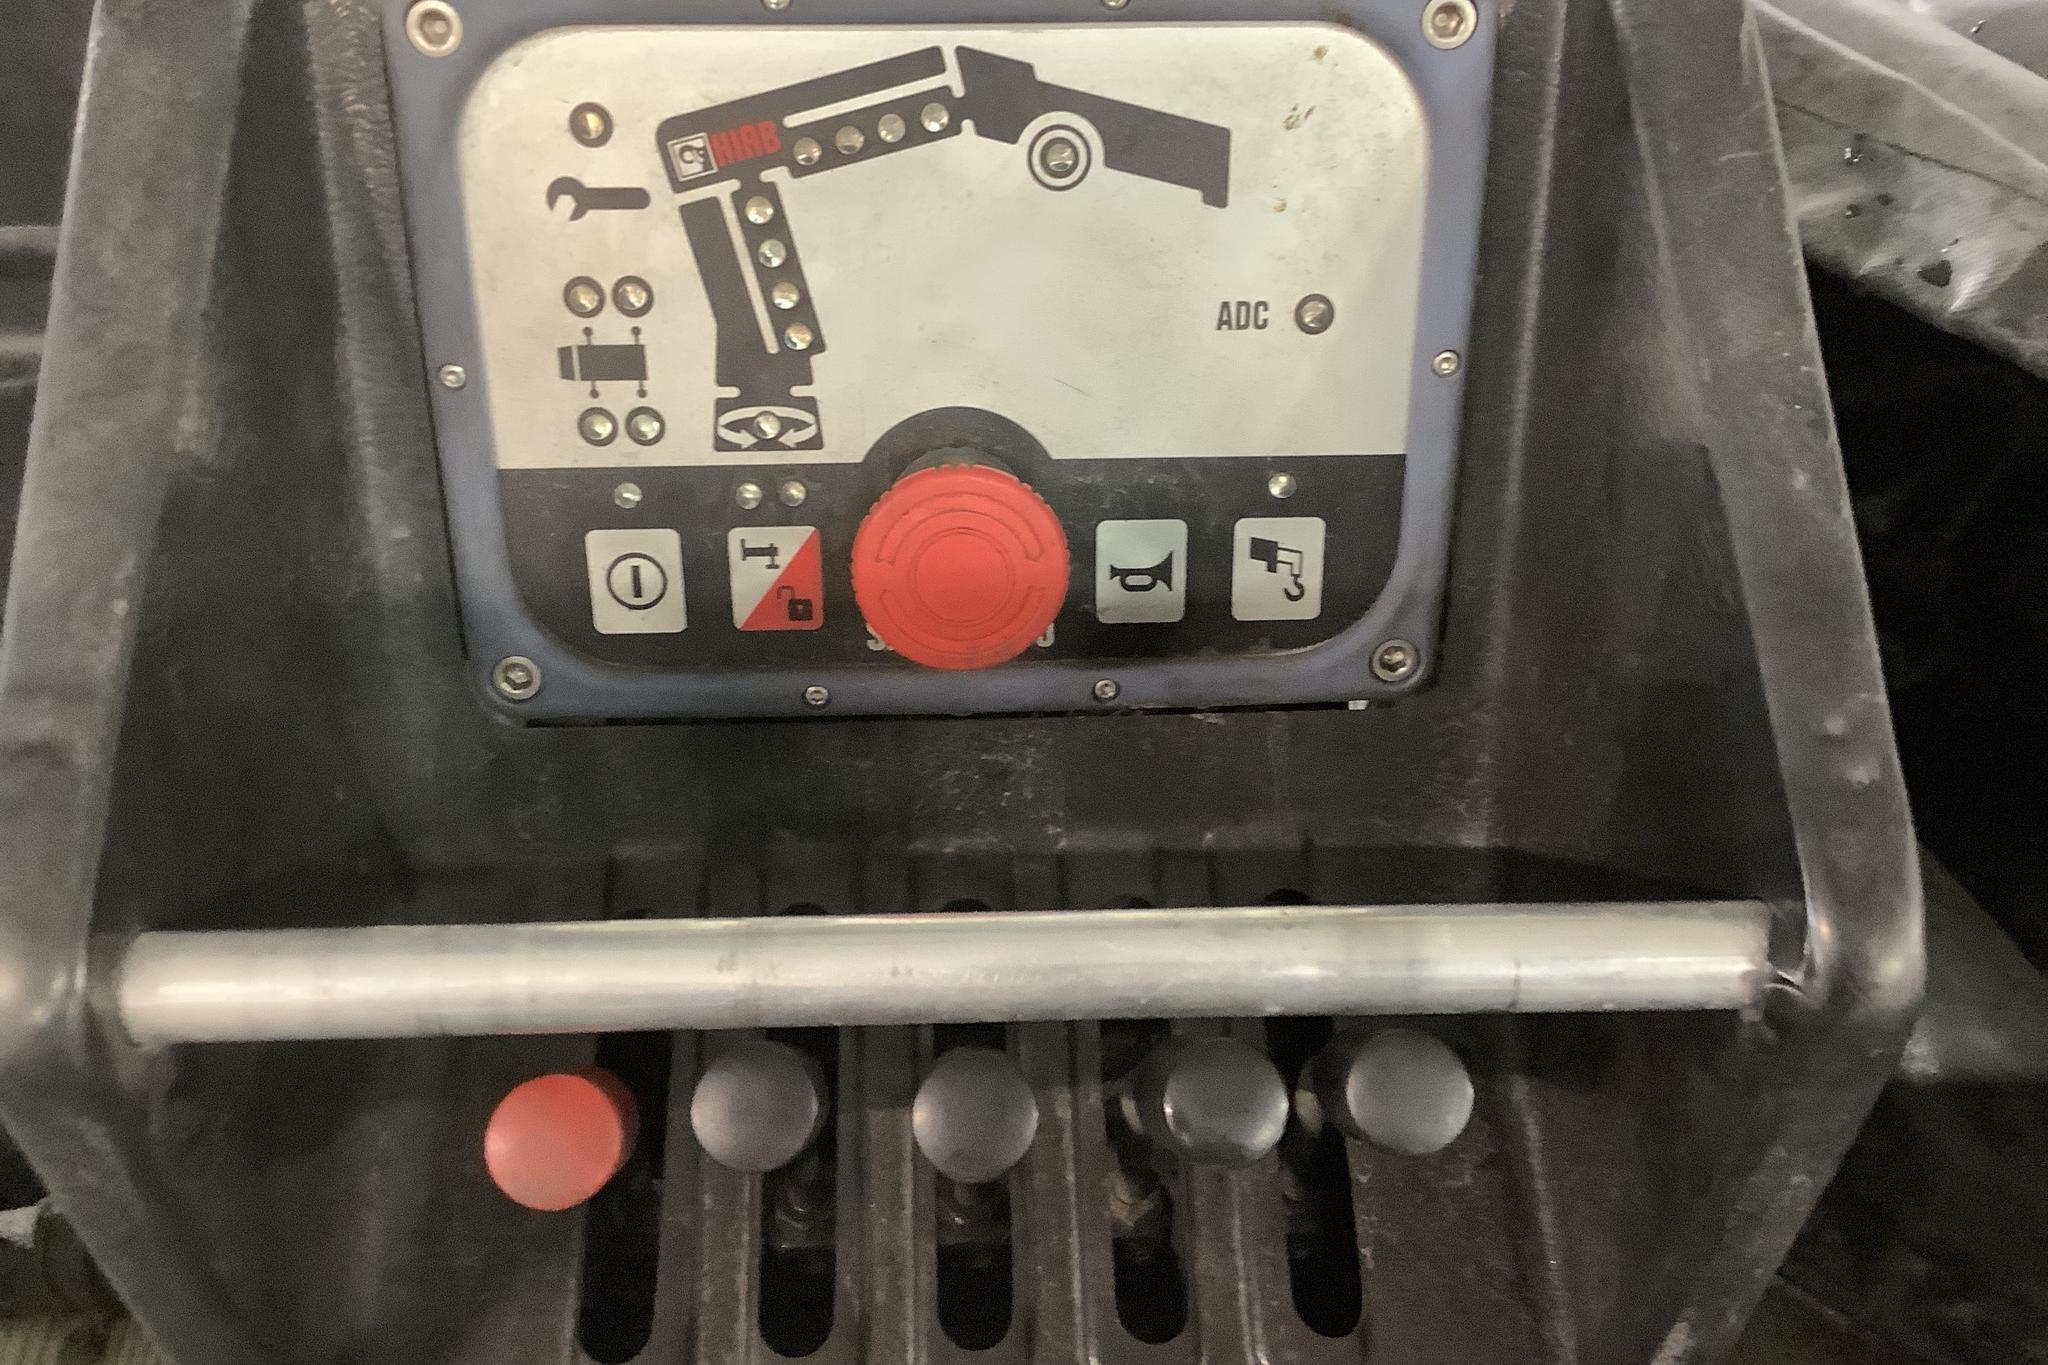 VW Crafter 35 2.5 TDI Flak (163hk) - 272 970 km - Manual - white - 2011